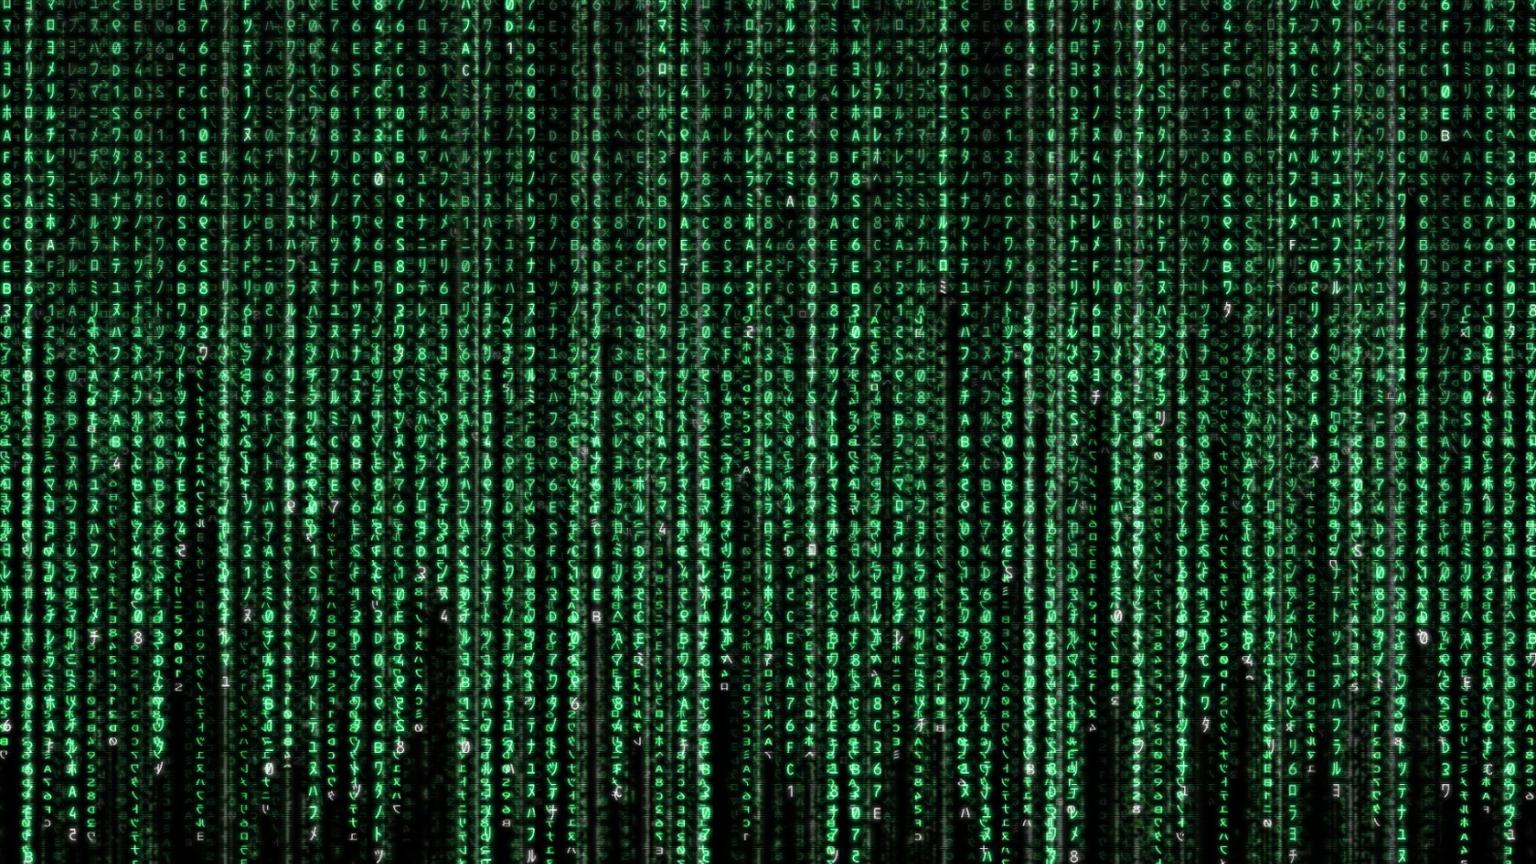 free download movies matrix wallpaper 1680x1050 movies matrix code 1680x1050 for your desktop mobile tablet explore 74 matrix movie wallpapers matrix movie wallpapers matrix movie wallpaper matrix backgrounds wallpapersafari